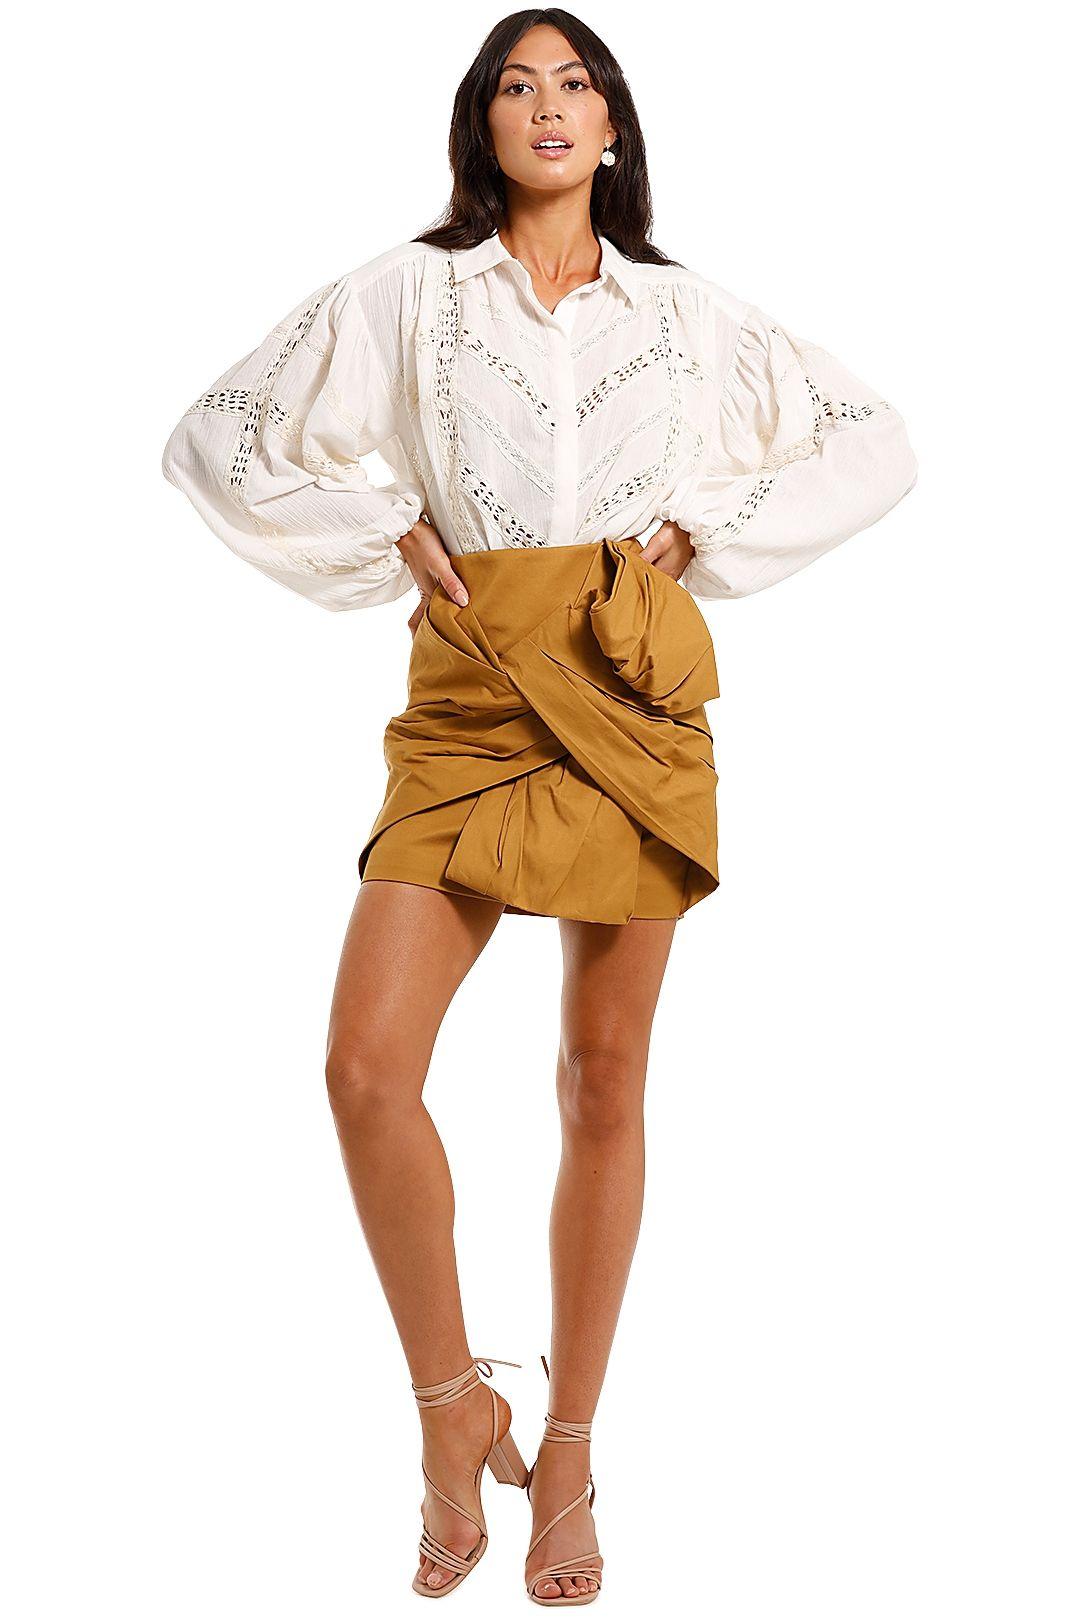 Shona Joy Chloe Chevron Shirt